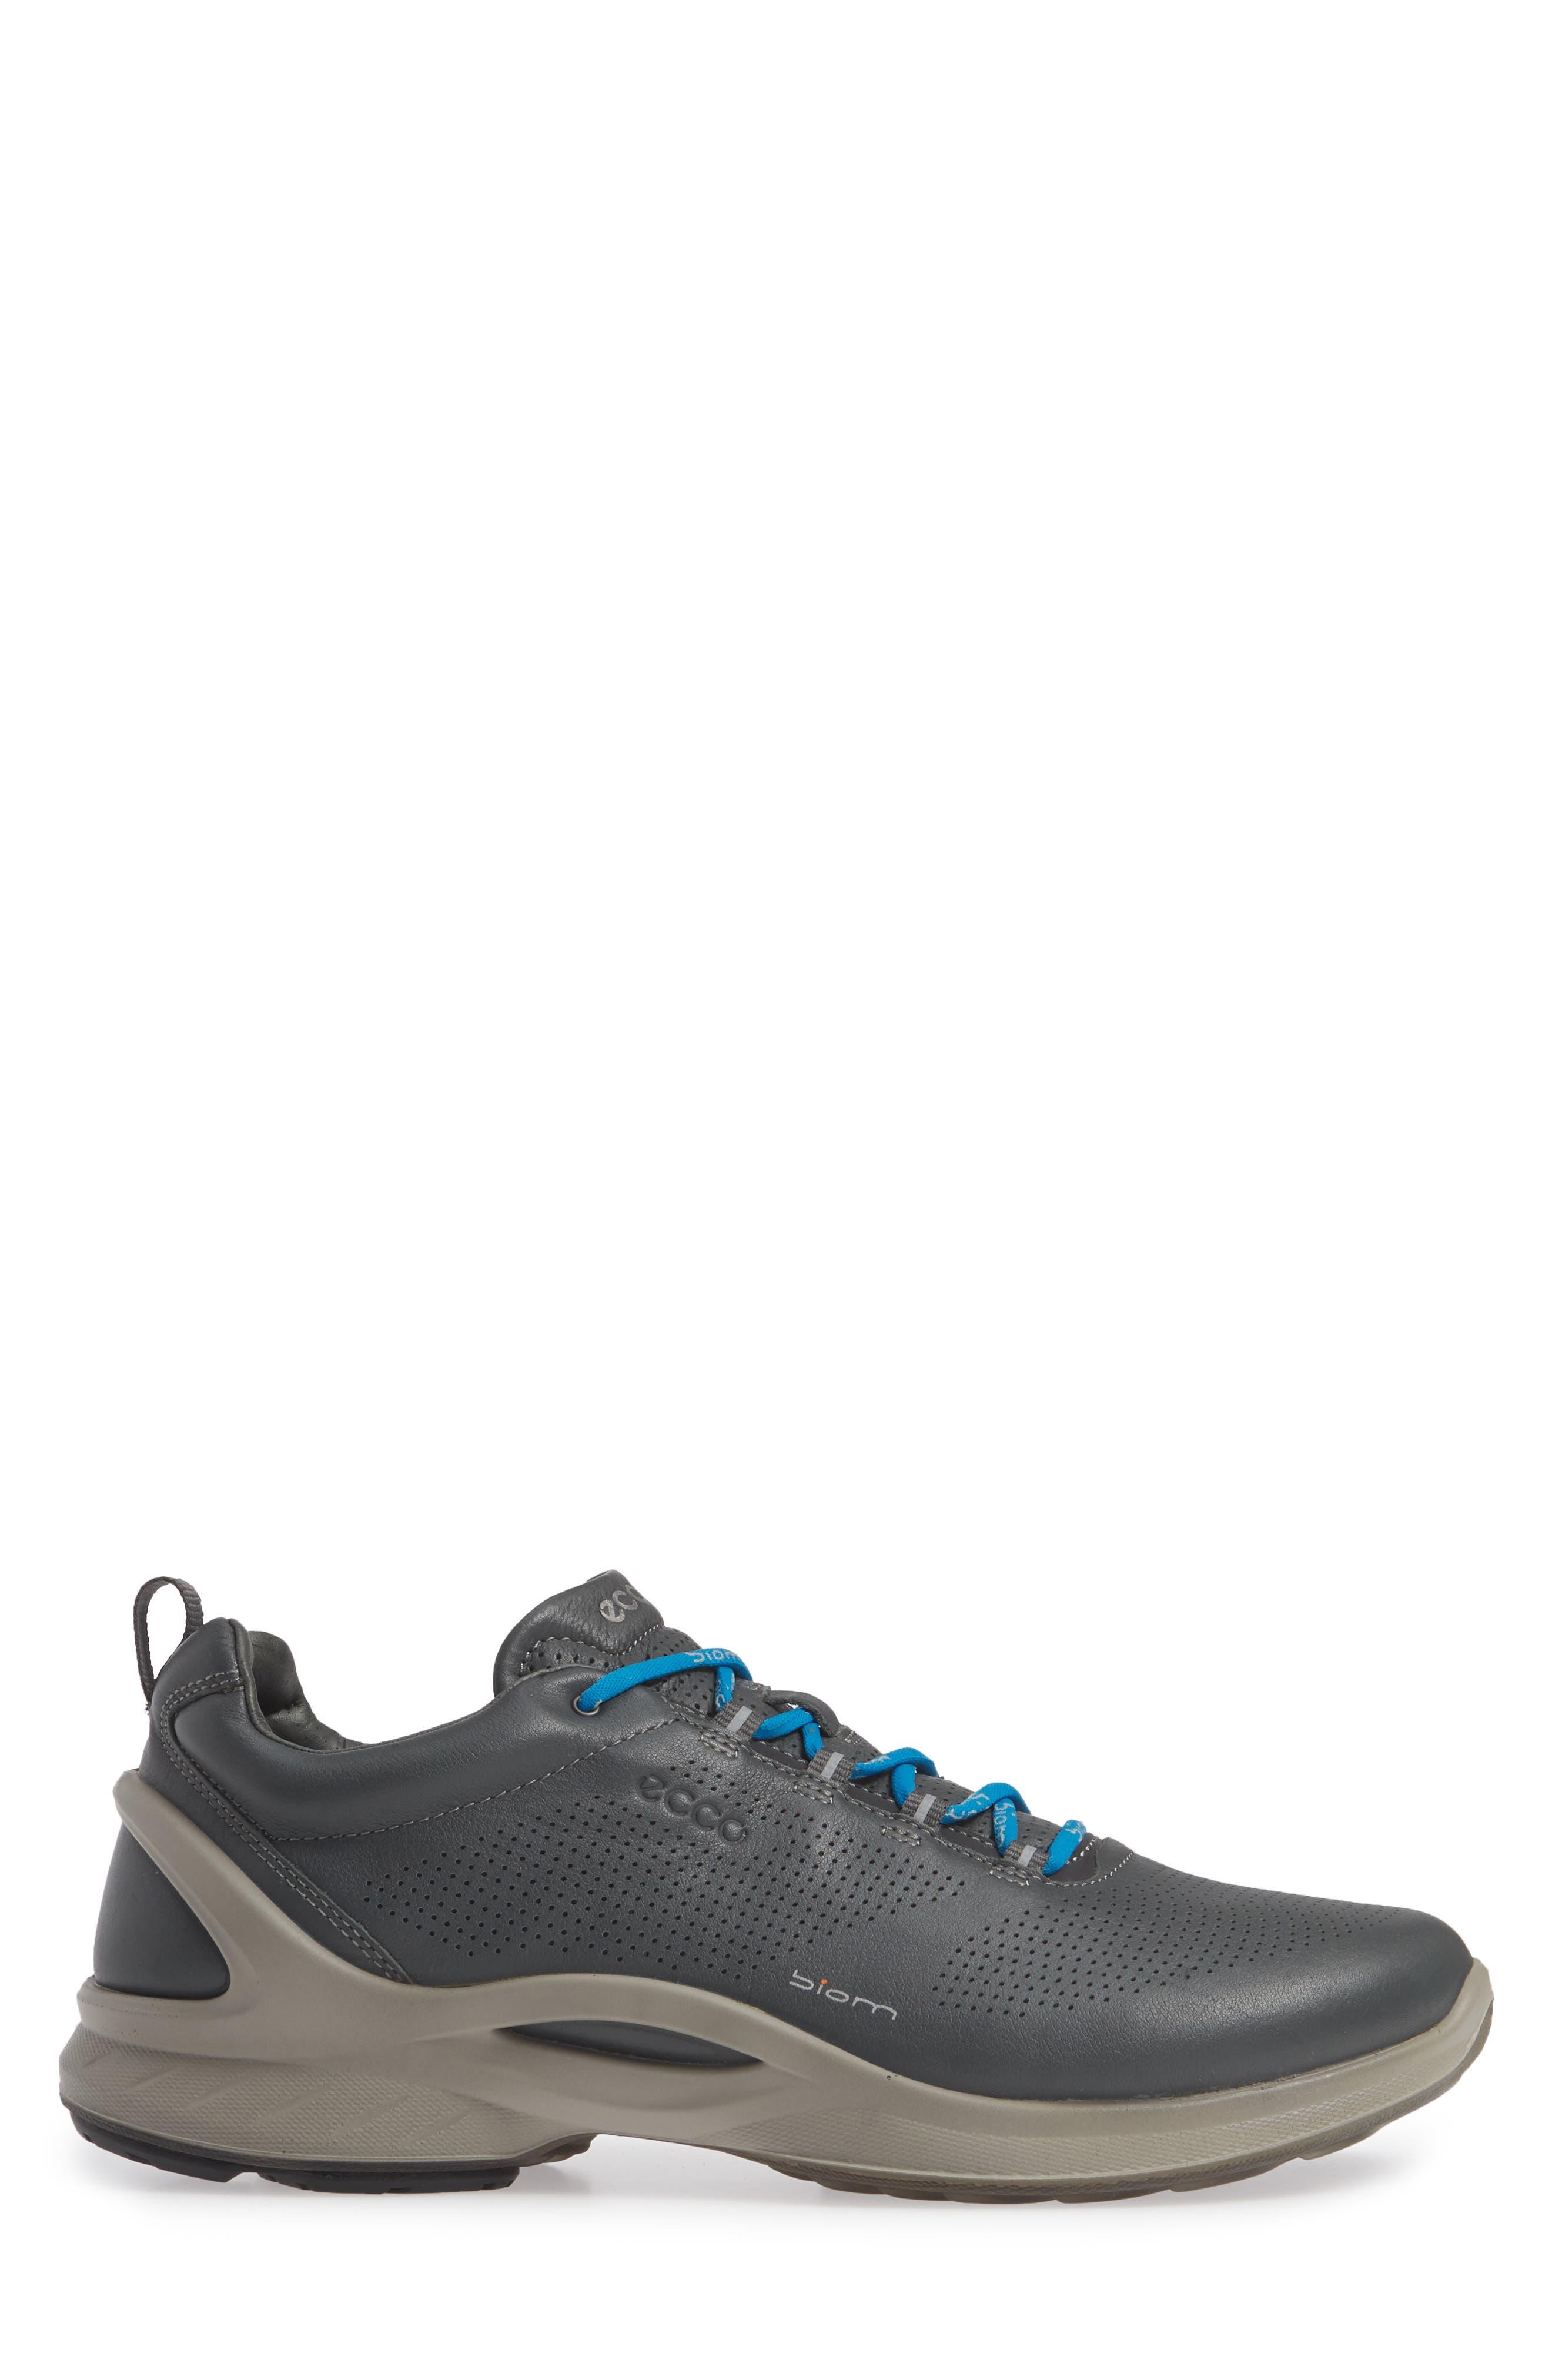 'BIOM Fjuel' Sneaker,                             Alternate thumbnail 3, color,                             DARK SHADOW LEATHER